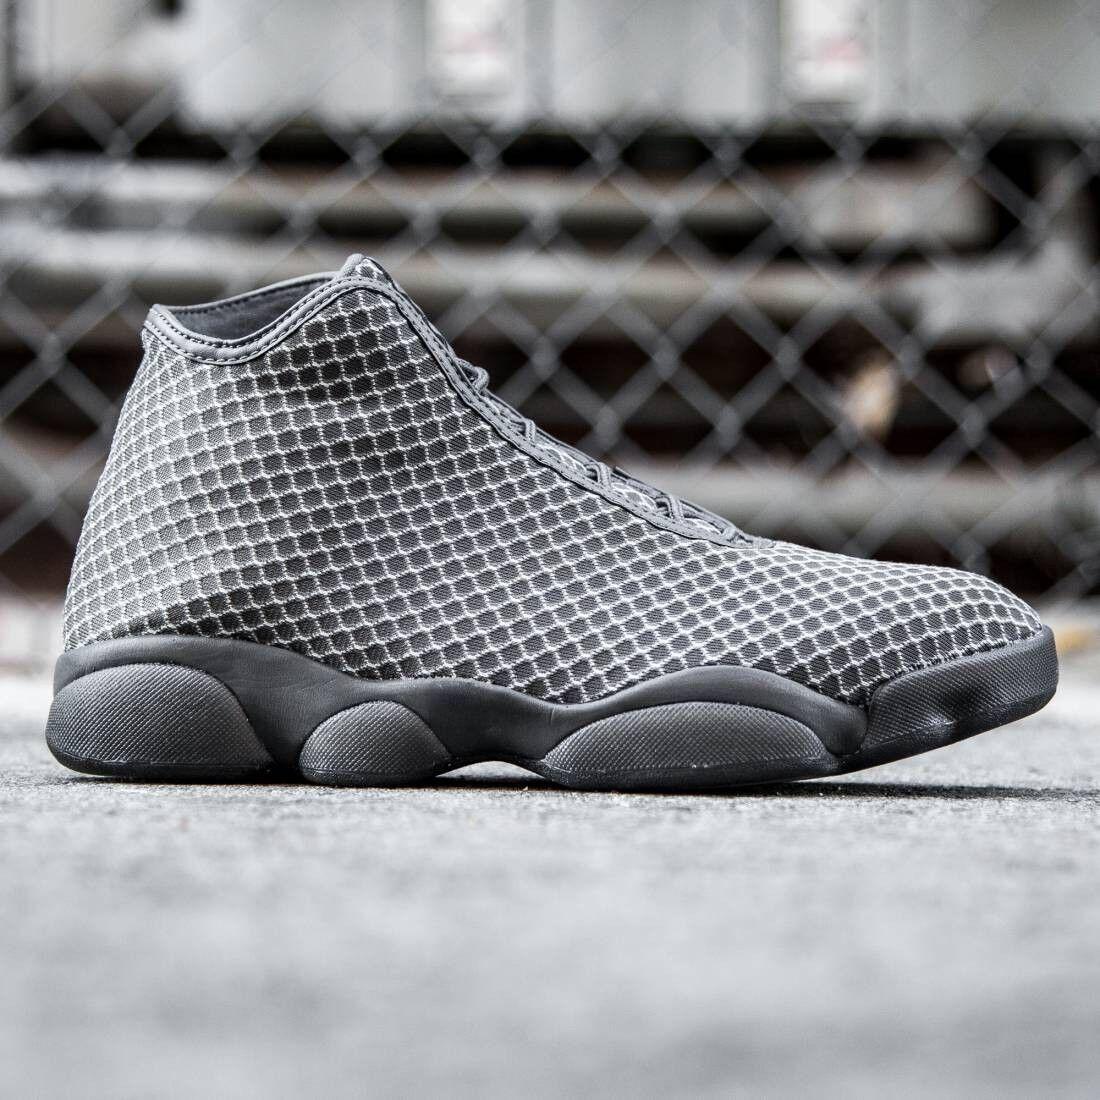 Nike Air Jordan Horizon 11.5. Future Wolf Grey Size 11.5. Horizon 823581-003 57df9e